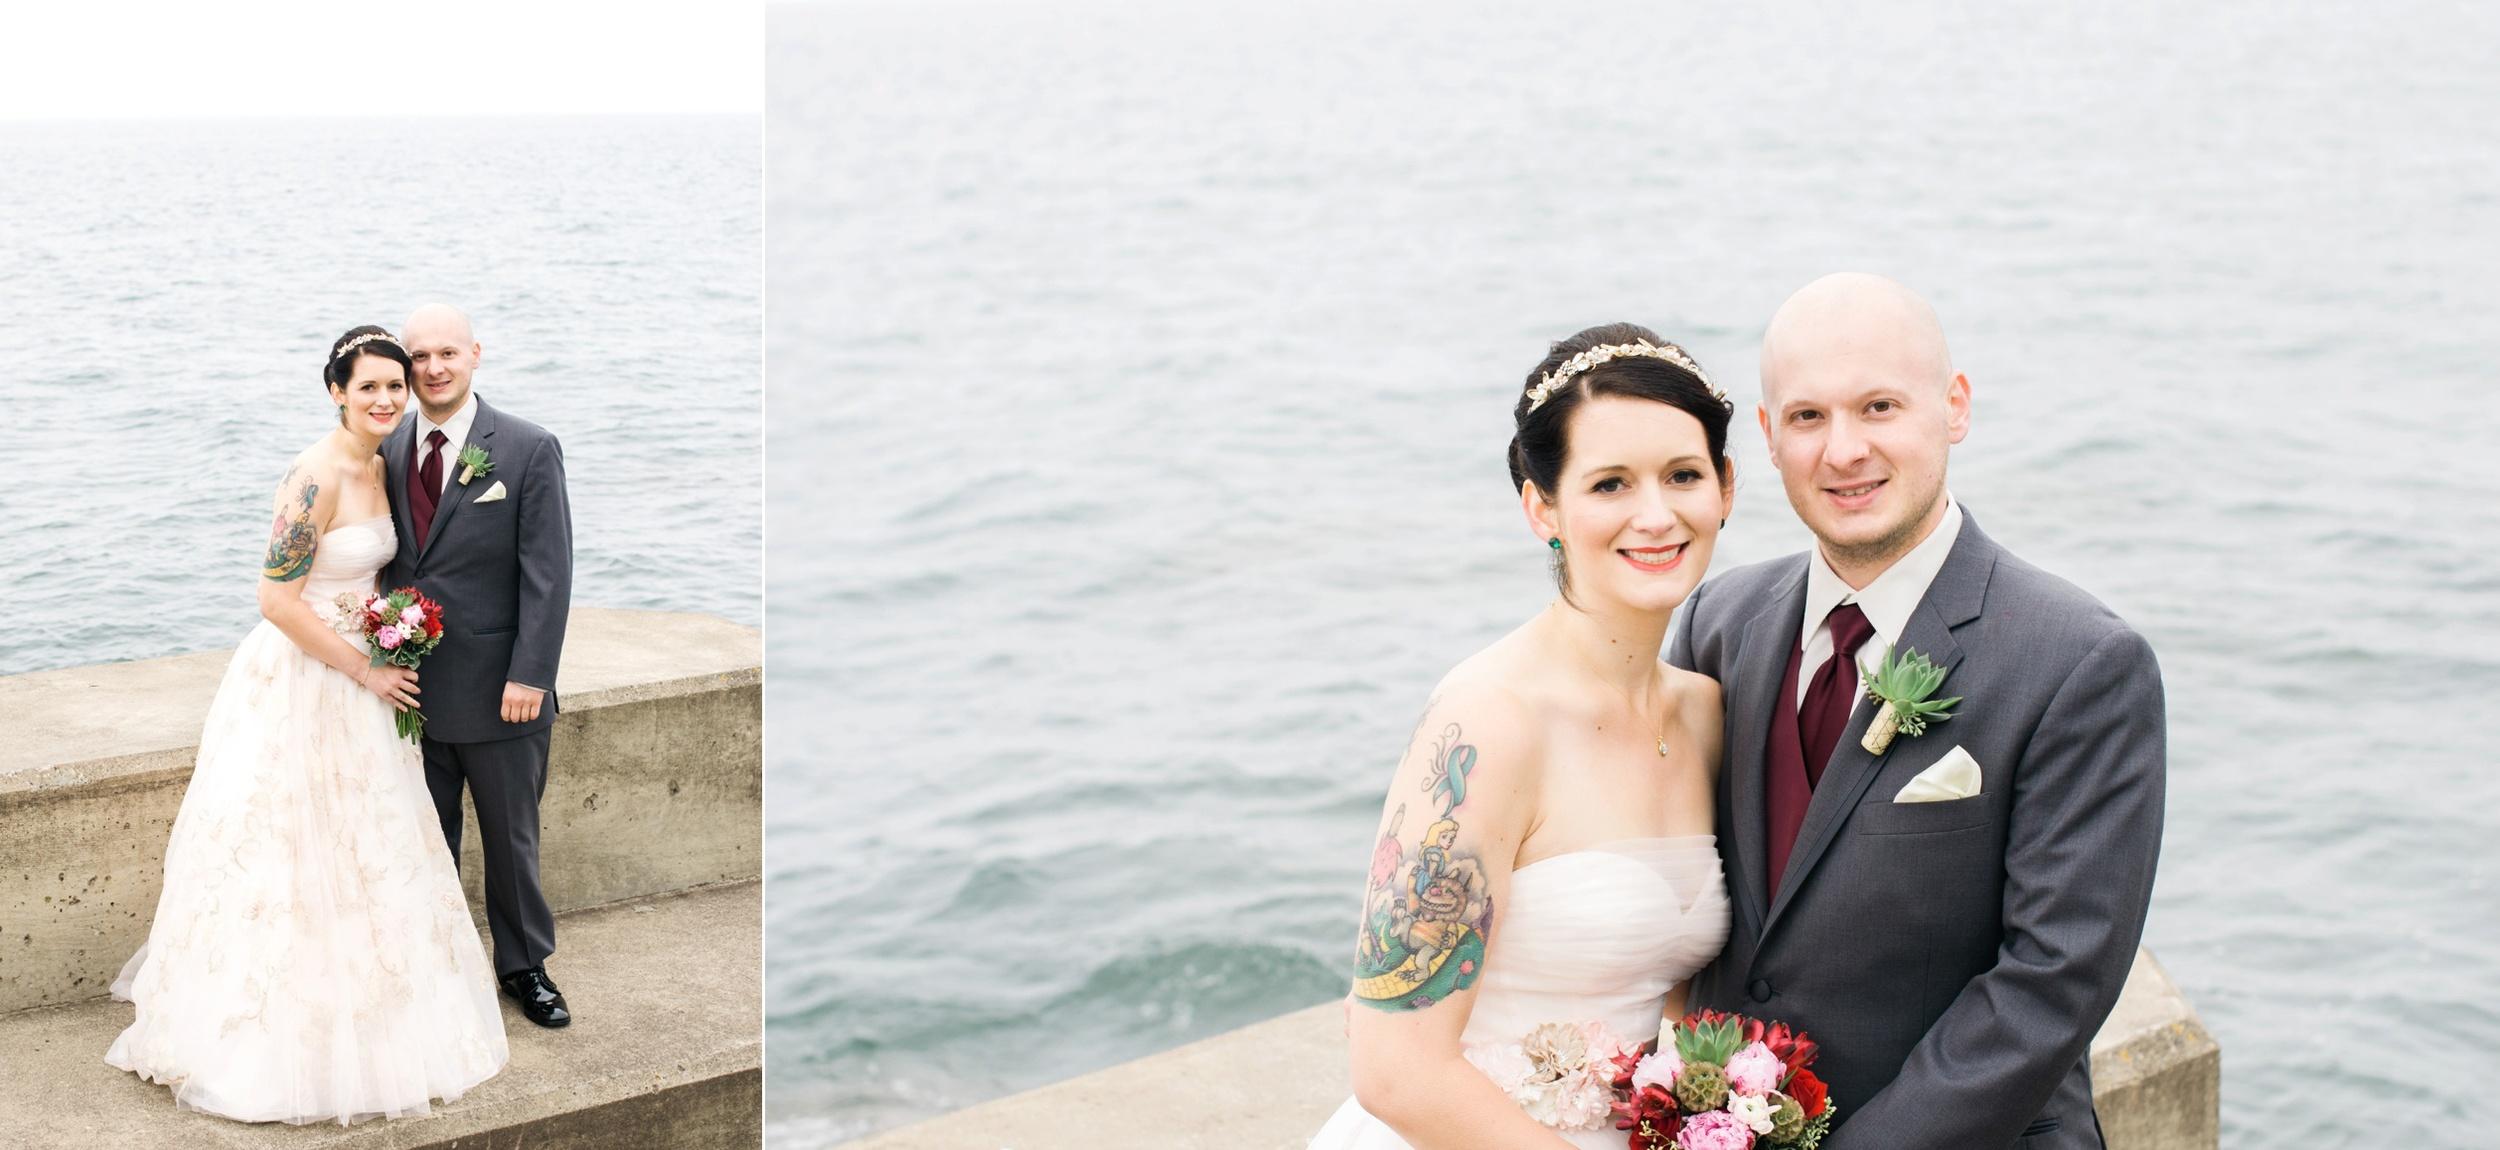 Glensheen Mansion Wedding | Duluth, MN Wedding Photographer_0496.jpg